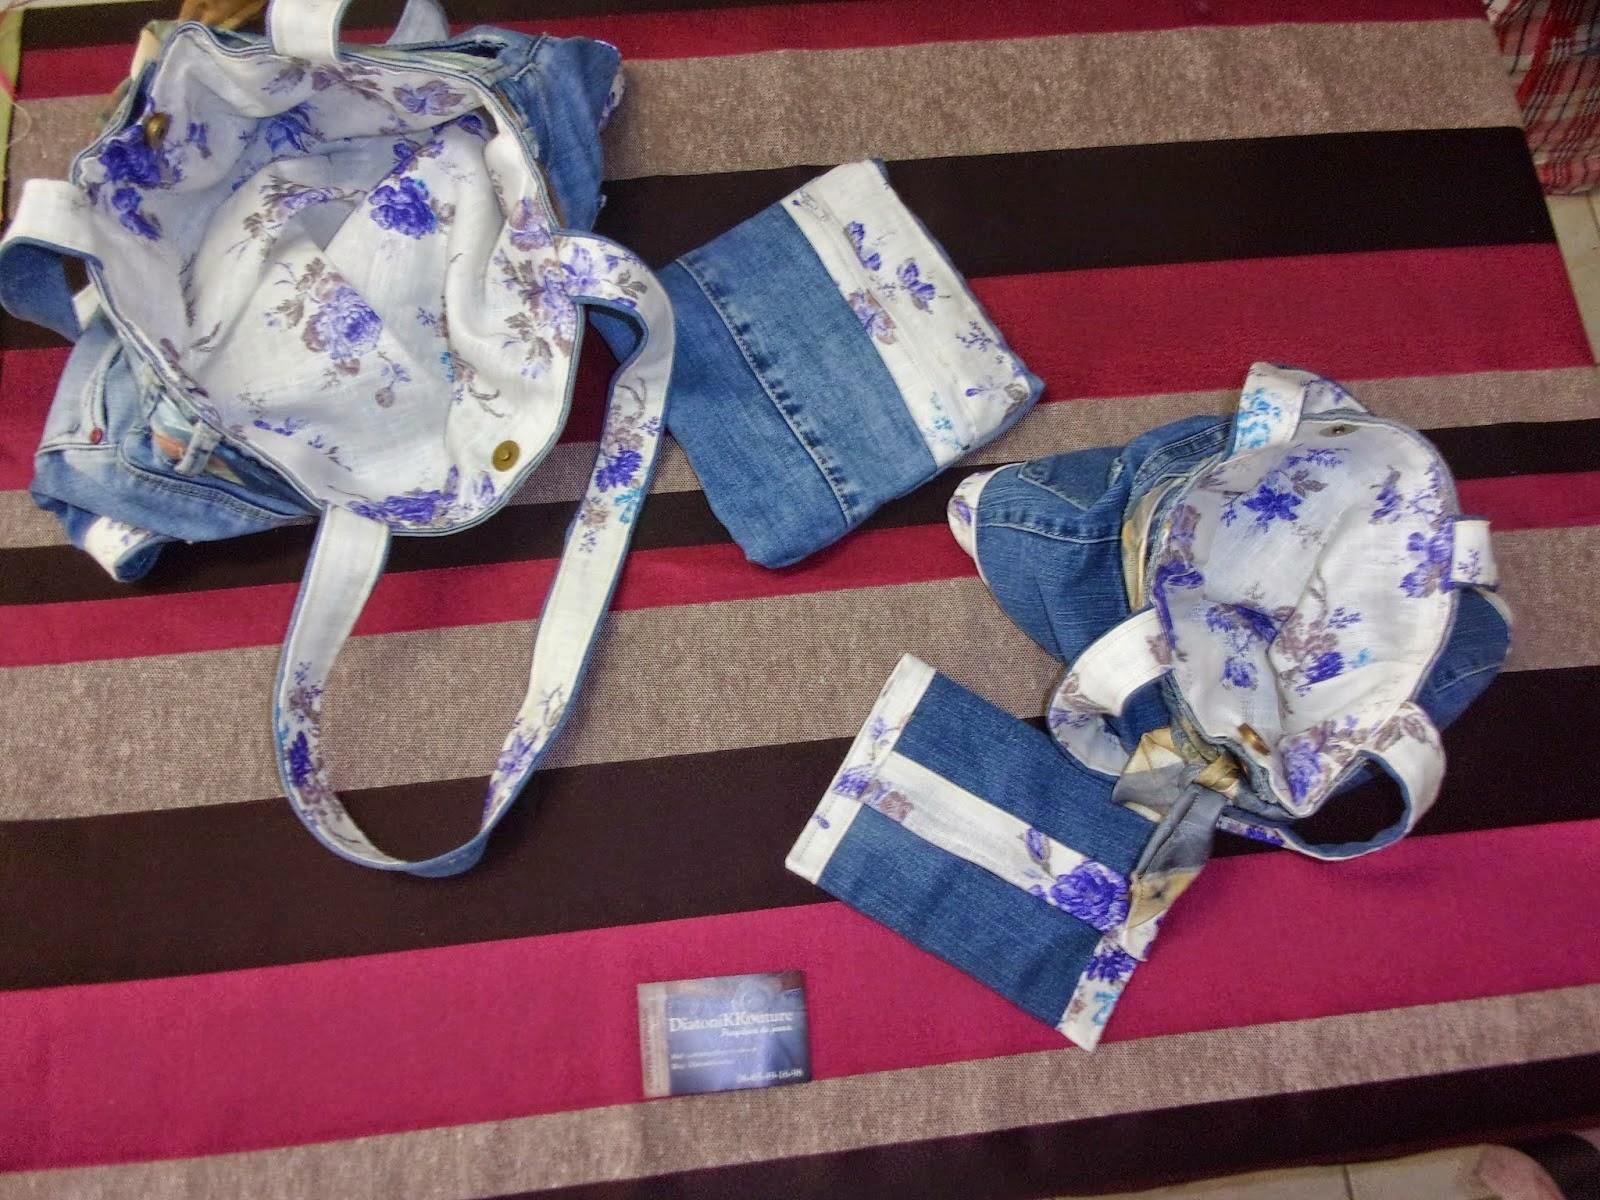 diatonikkouture stephane cotten sac a main assorti en jean femme et enfant. Black Bedroom Furniture Sets. Home Design Ideas